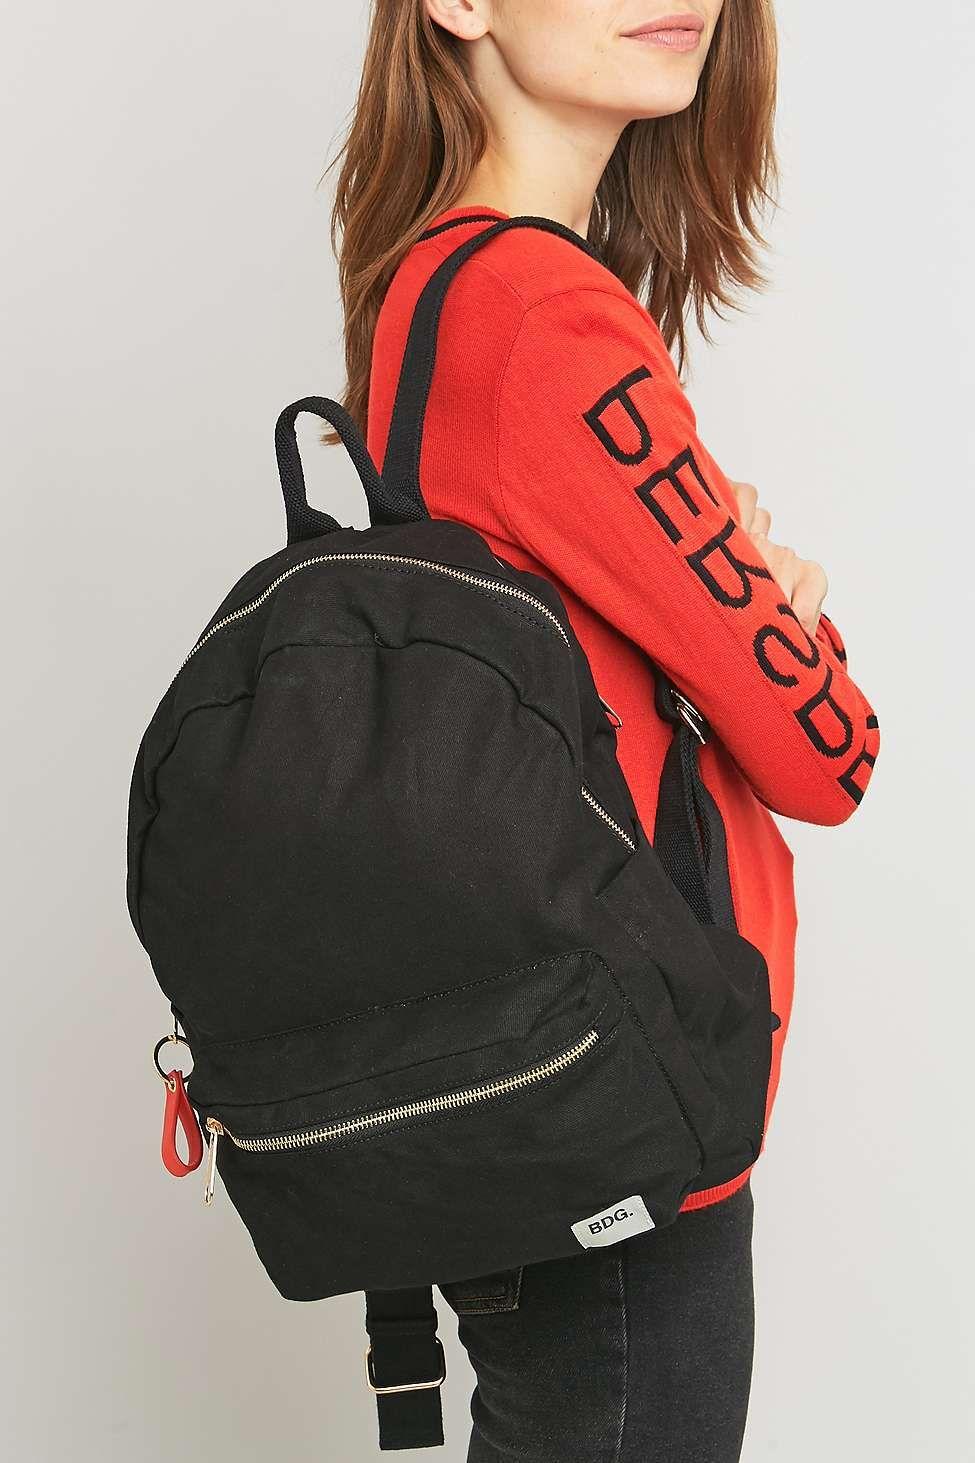 7baebfb1d856 Bdg Canvas Backpack Black- Fenix Toulouse Handball